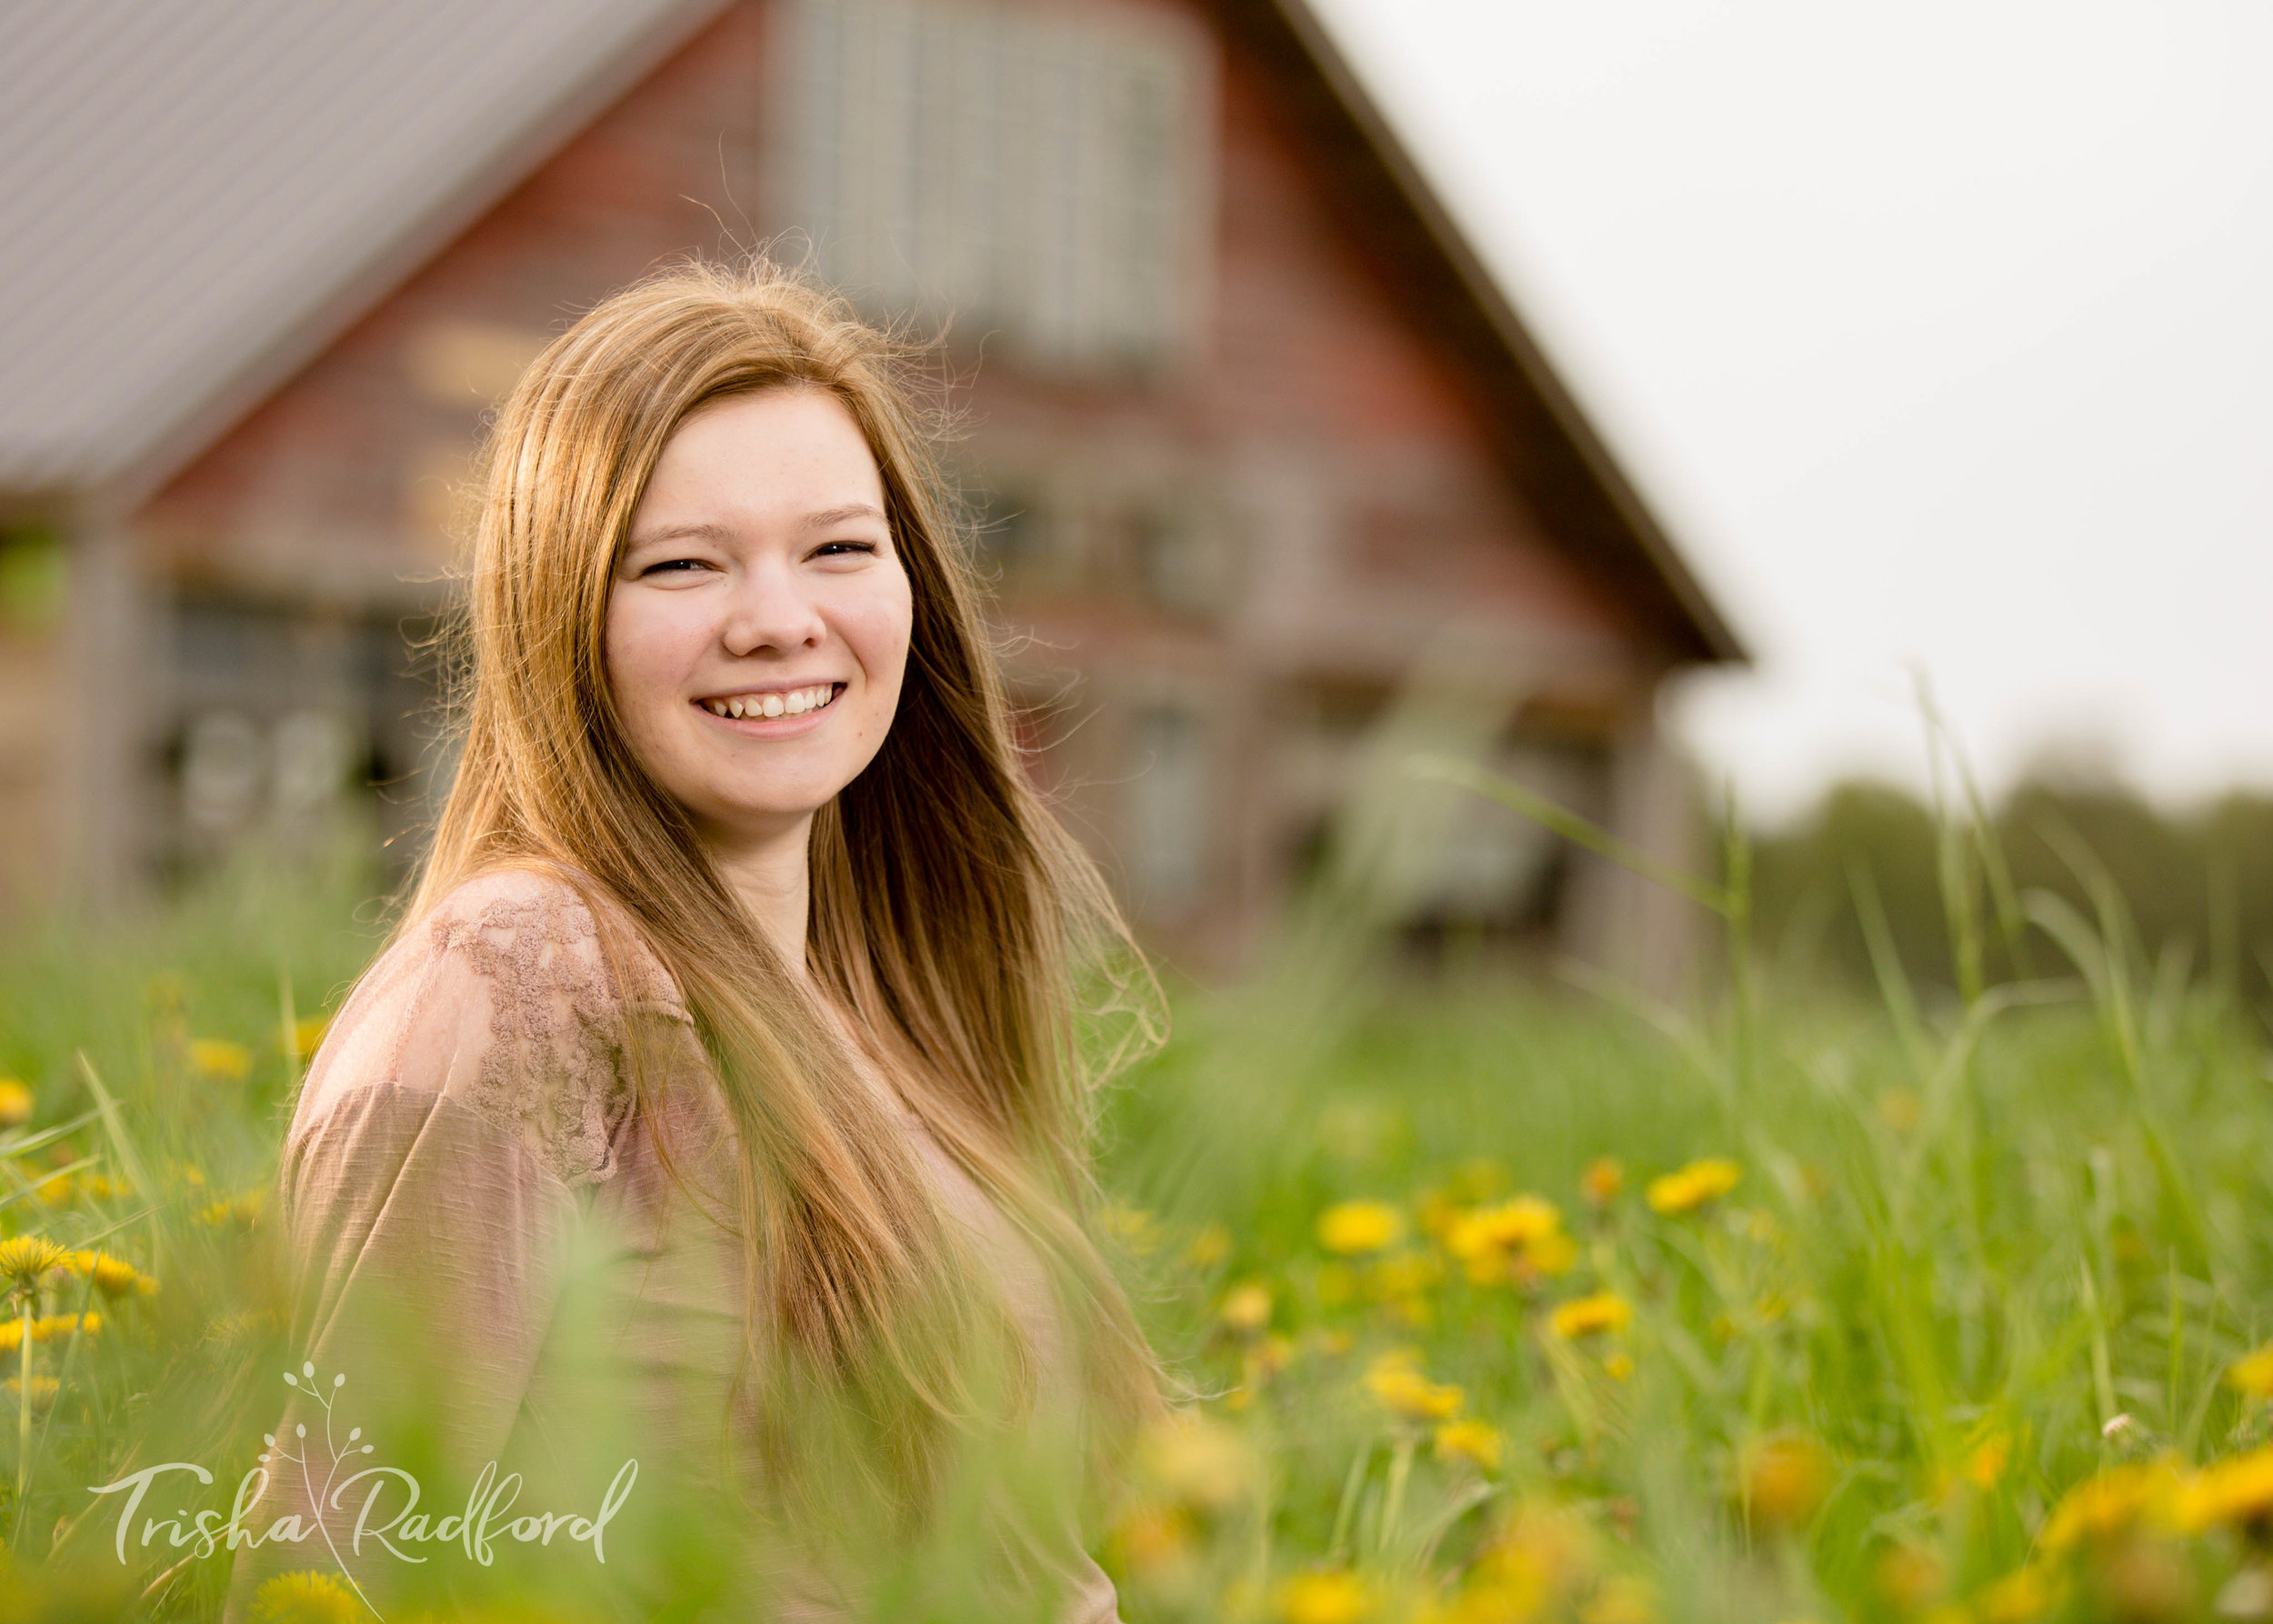 Senior Portrait Photographer, Snohomish County WA, Arlington, Lake Stevens